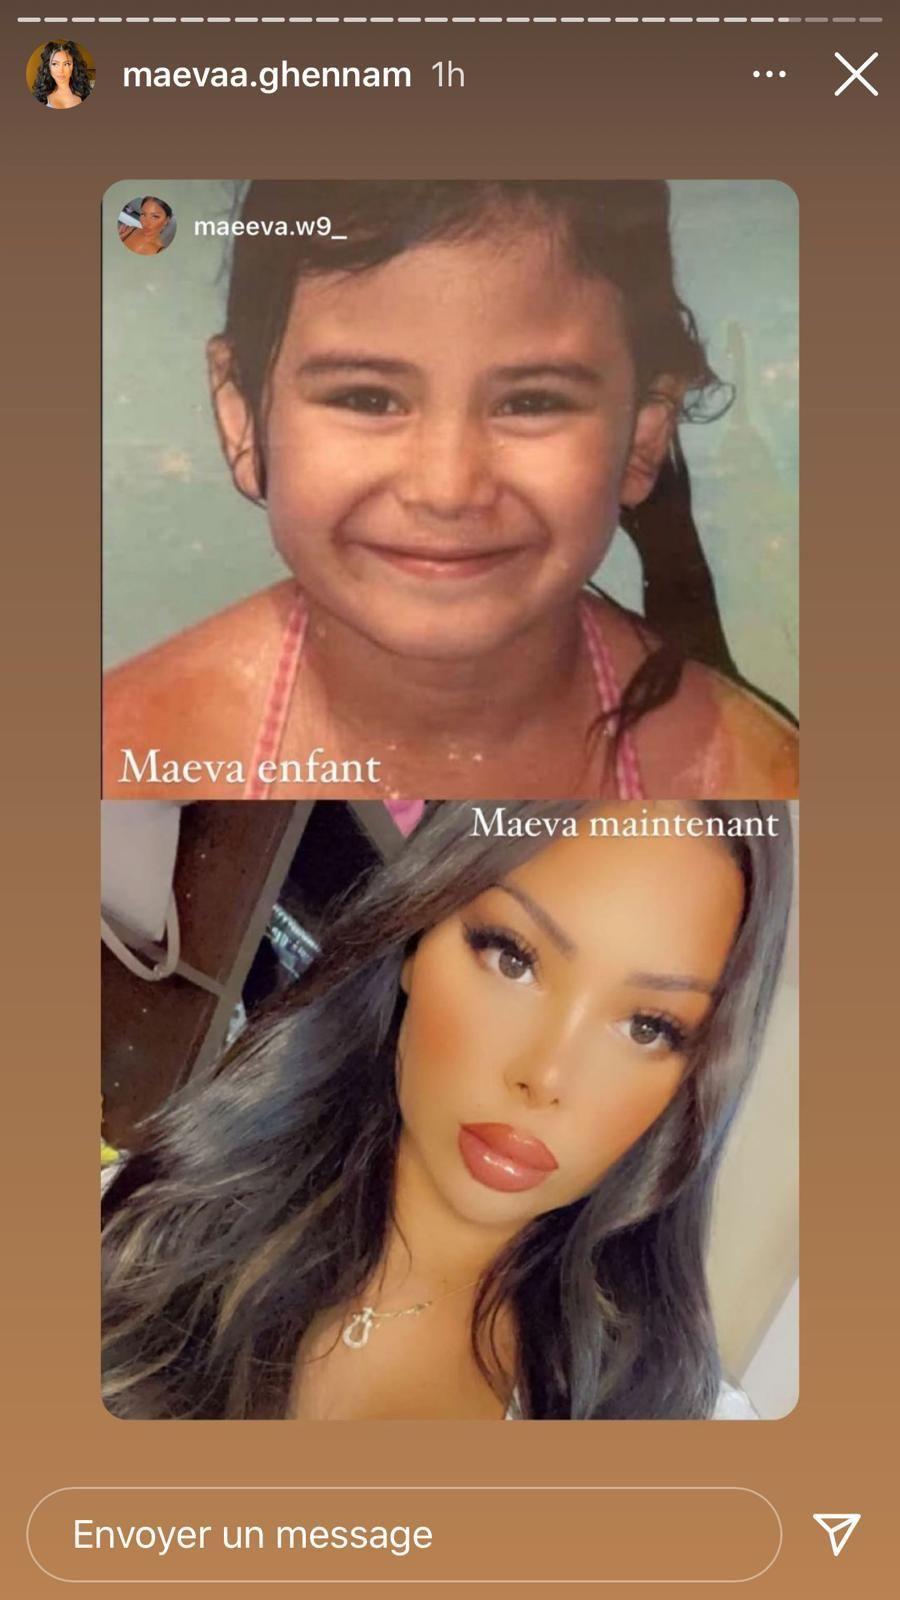 Maeva Ghennam enfant